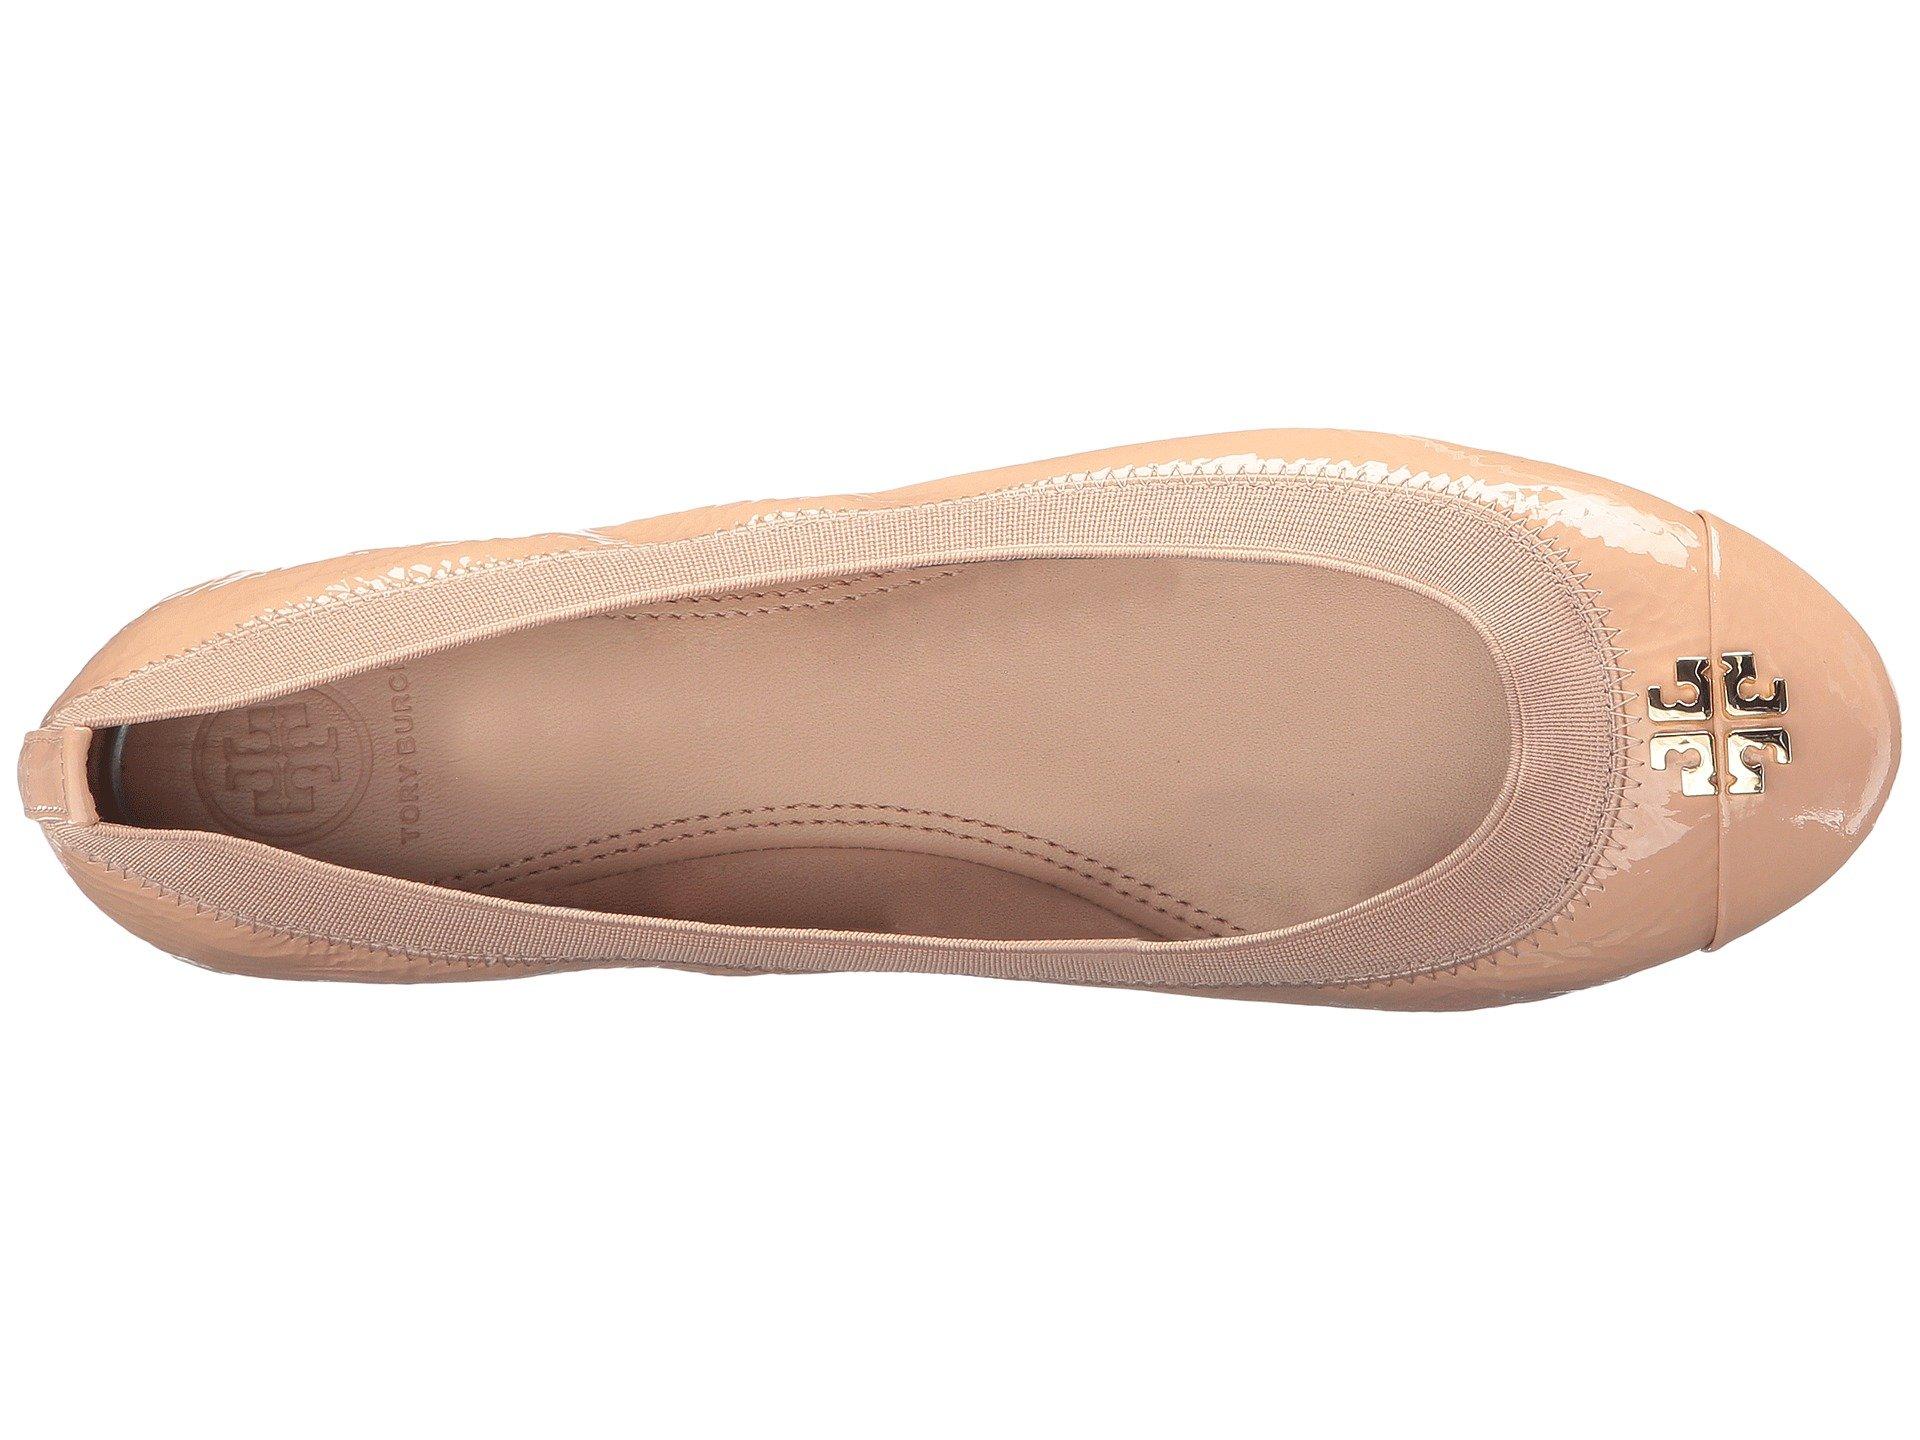 Tory Burch Jolie Ballet Flat (8 B (M) US, Light Oak) by Tory Burch (Image #9)